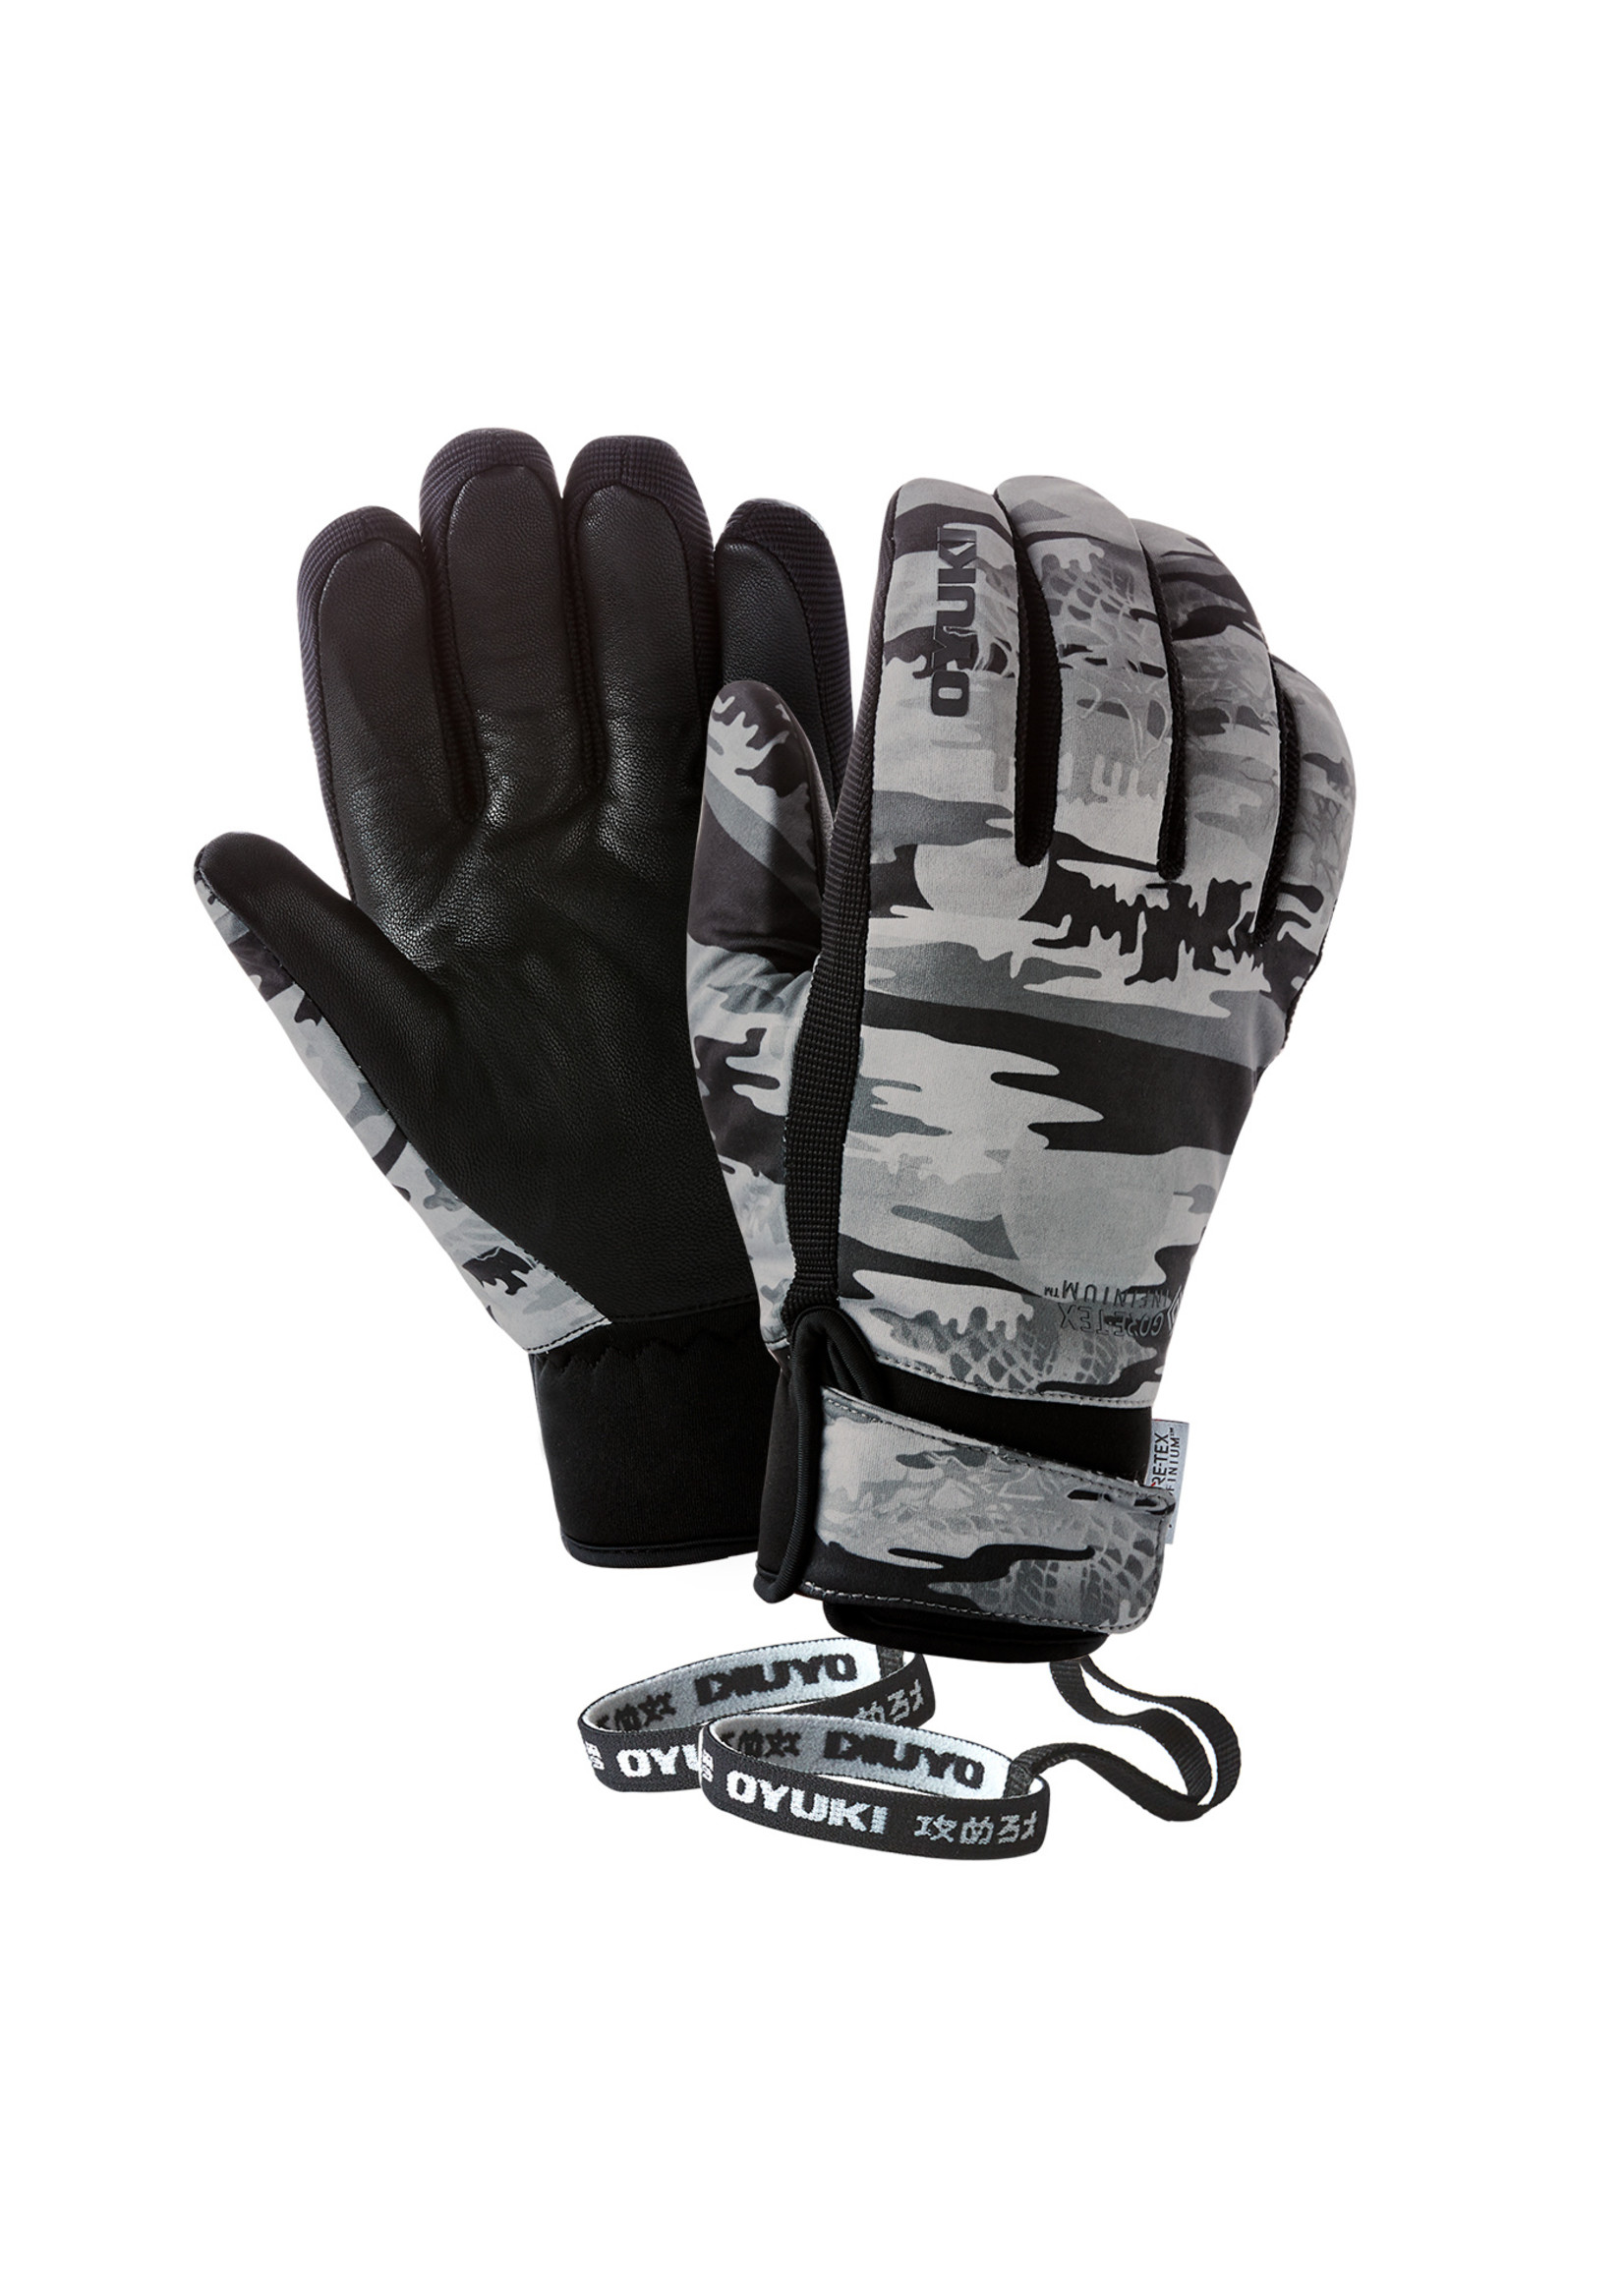 Haru Glove